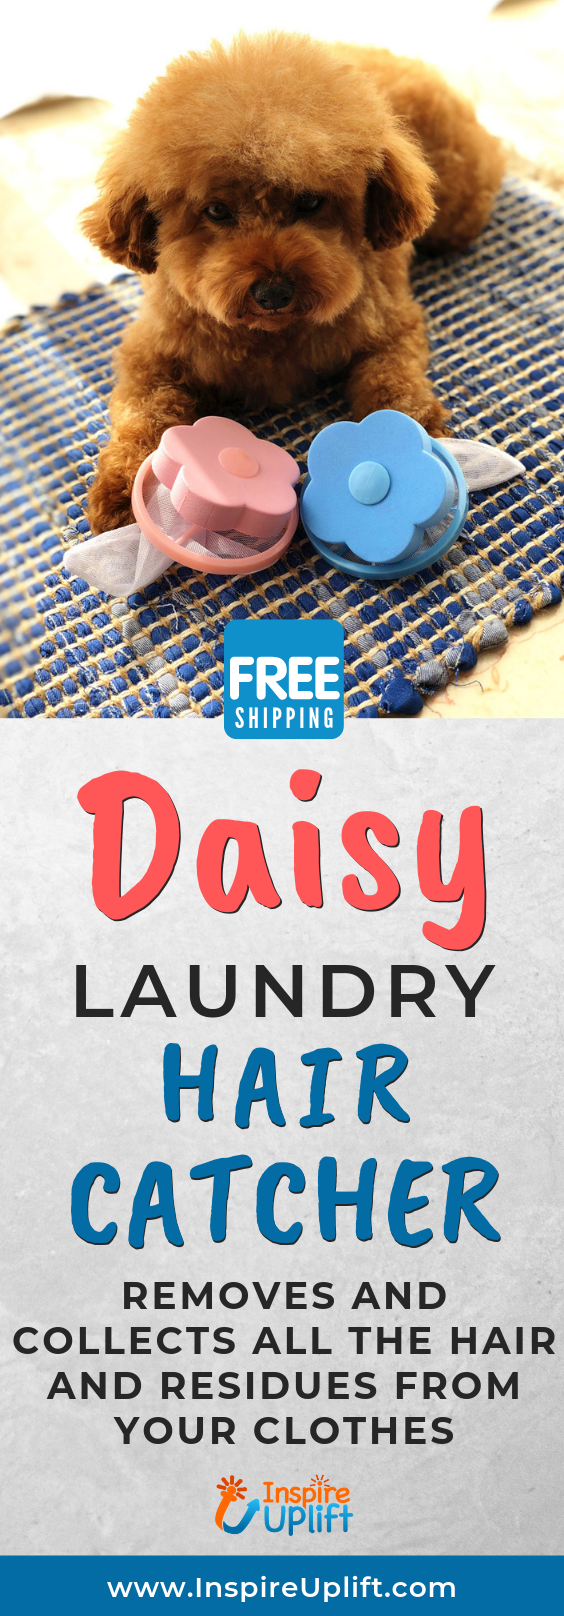 Daisy Laundry Hair Catcher Laundry Household Hacks Dog Hair